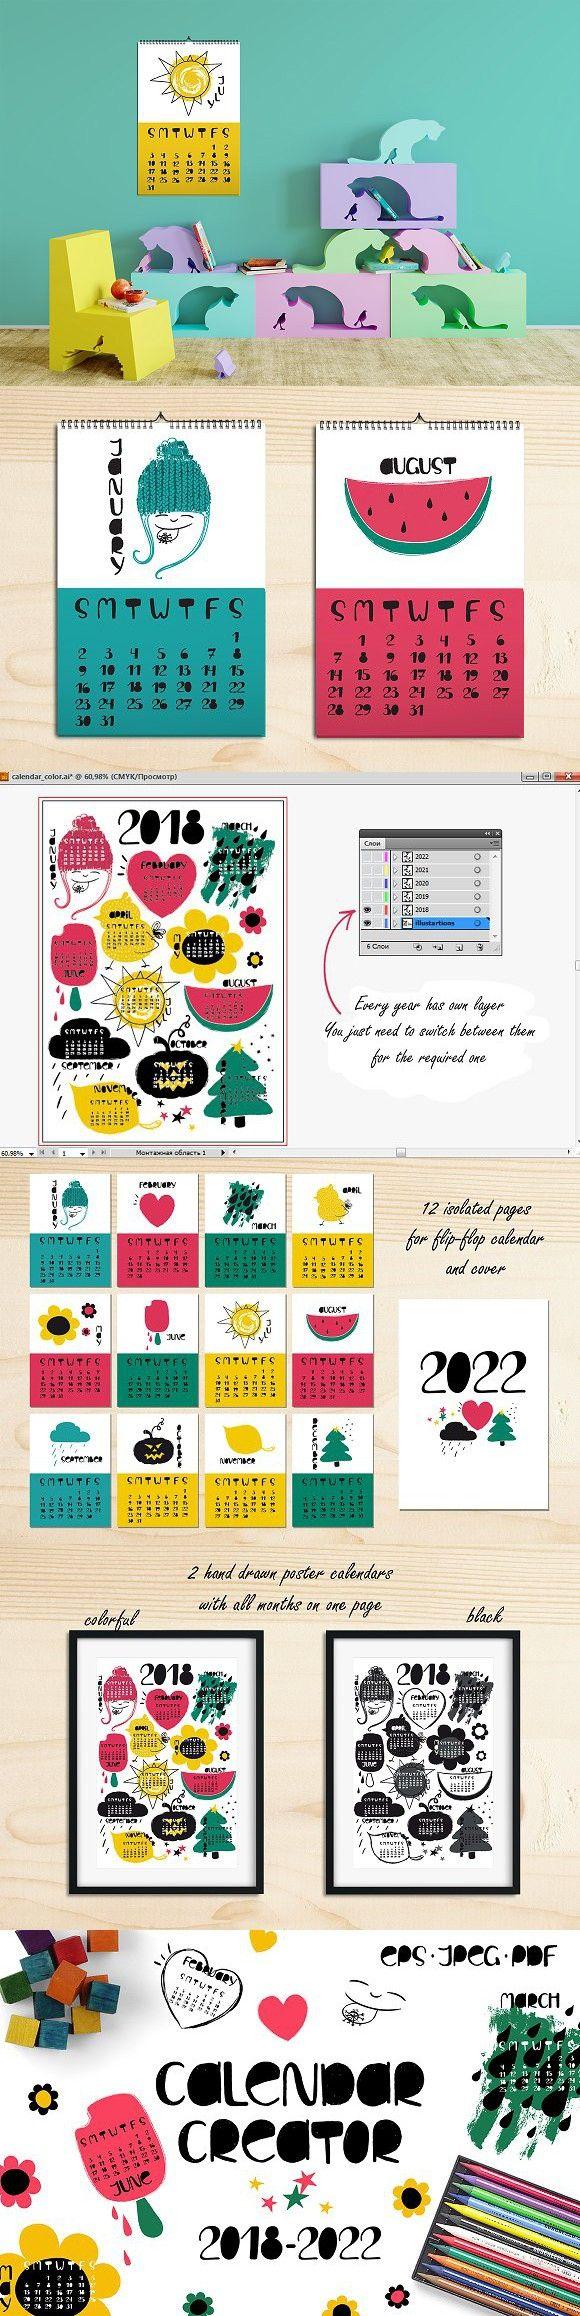 Calendar Creator 2022.Calendar Creator Calendar Creator Coloring Calendar Calendar Design